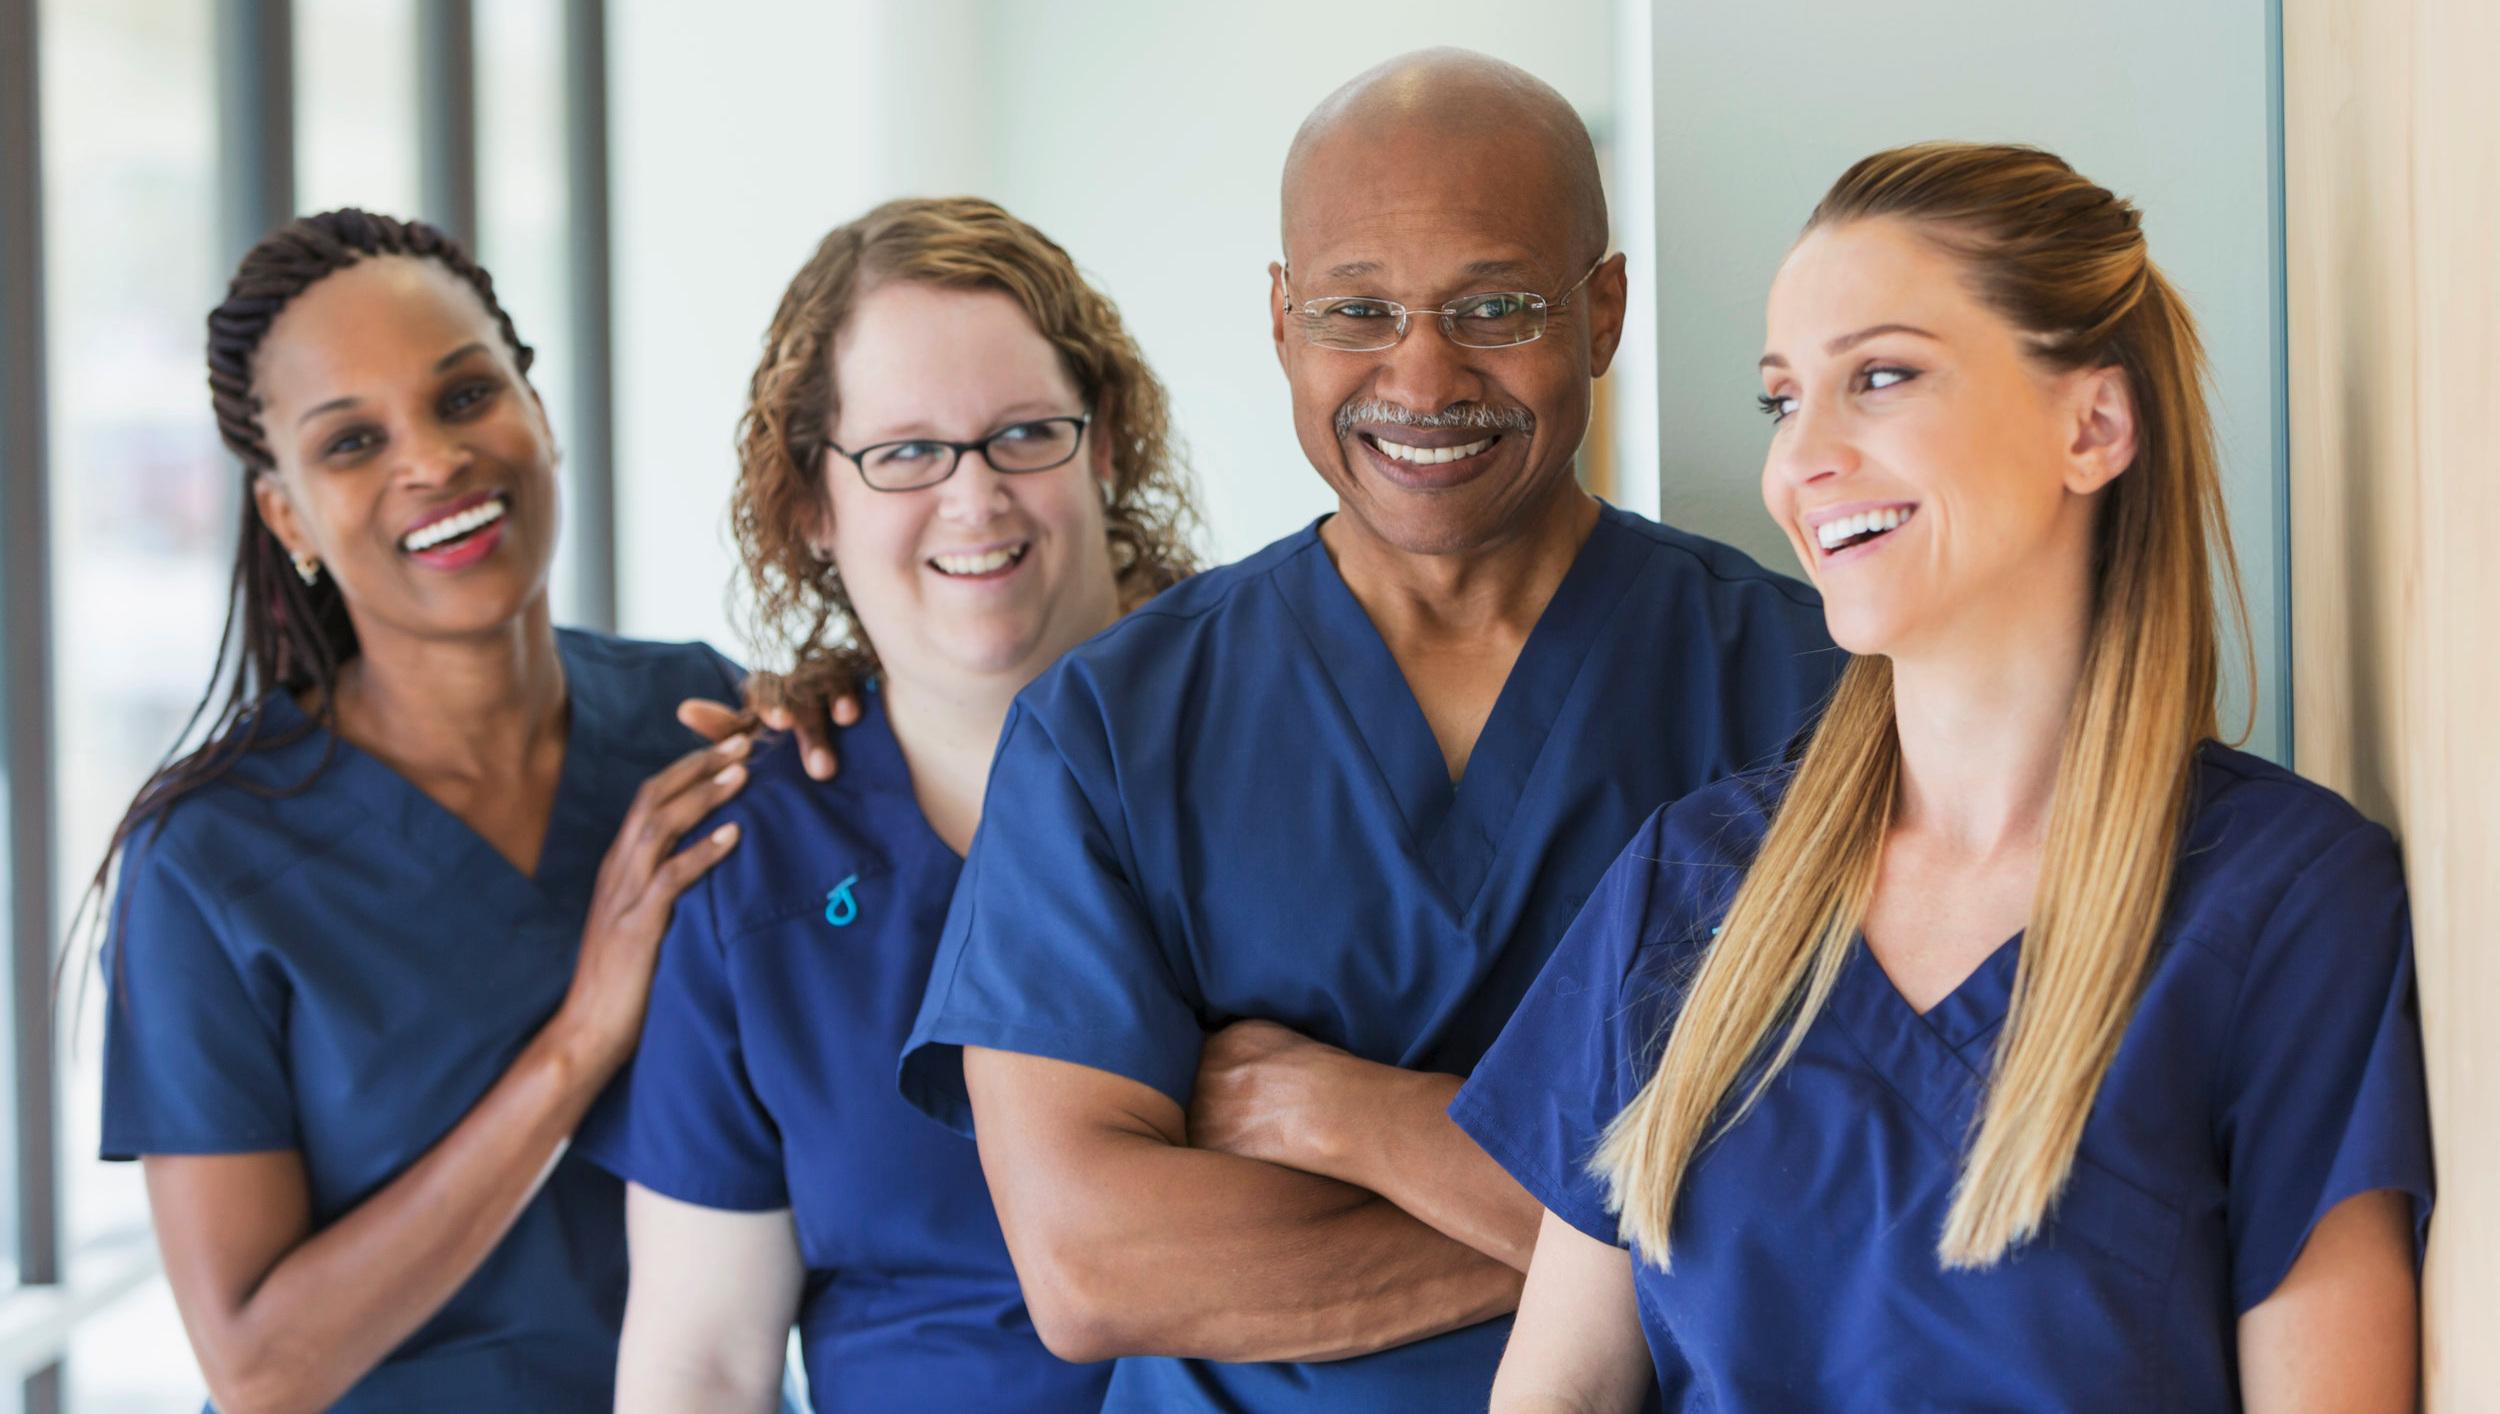 Man-leading-team-of-multi-ethnic-medical-professionals.jpg